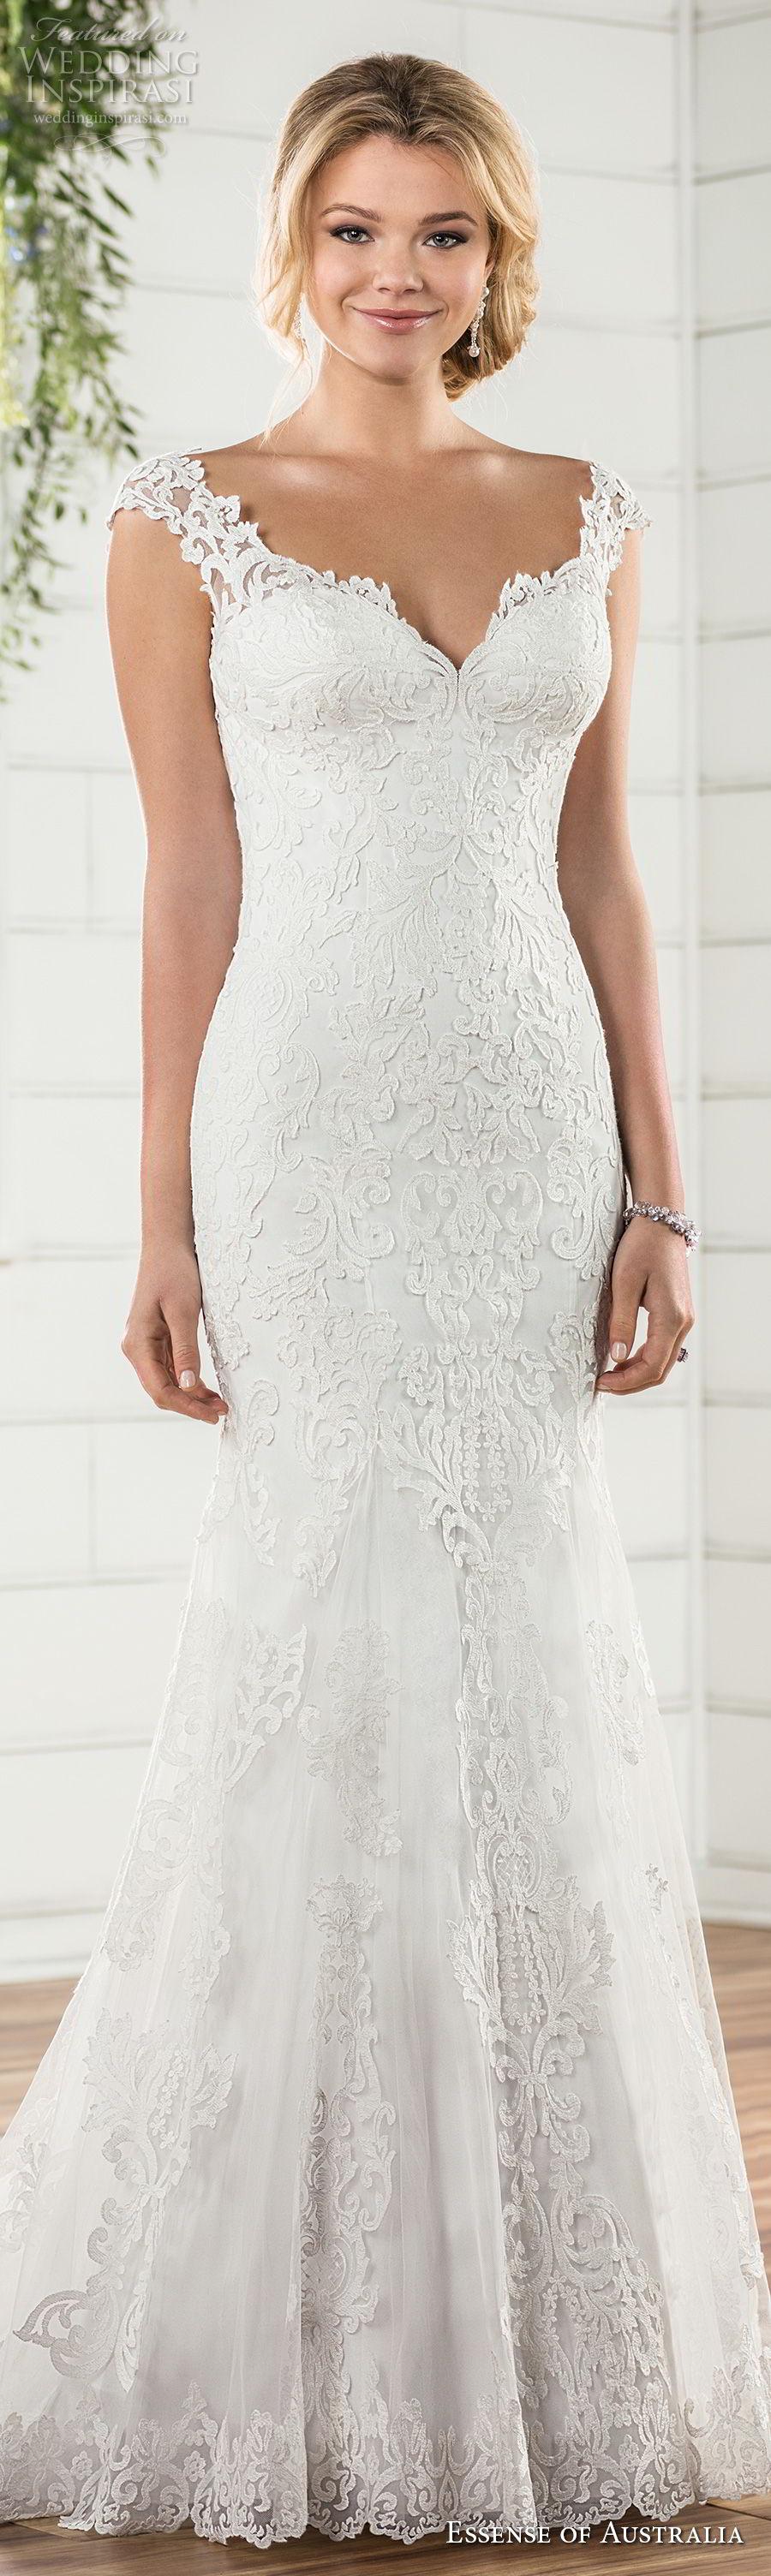 Australian Essence Wedding Dresses 57 Perfect essense australia fall bridal